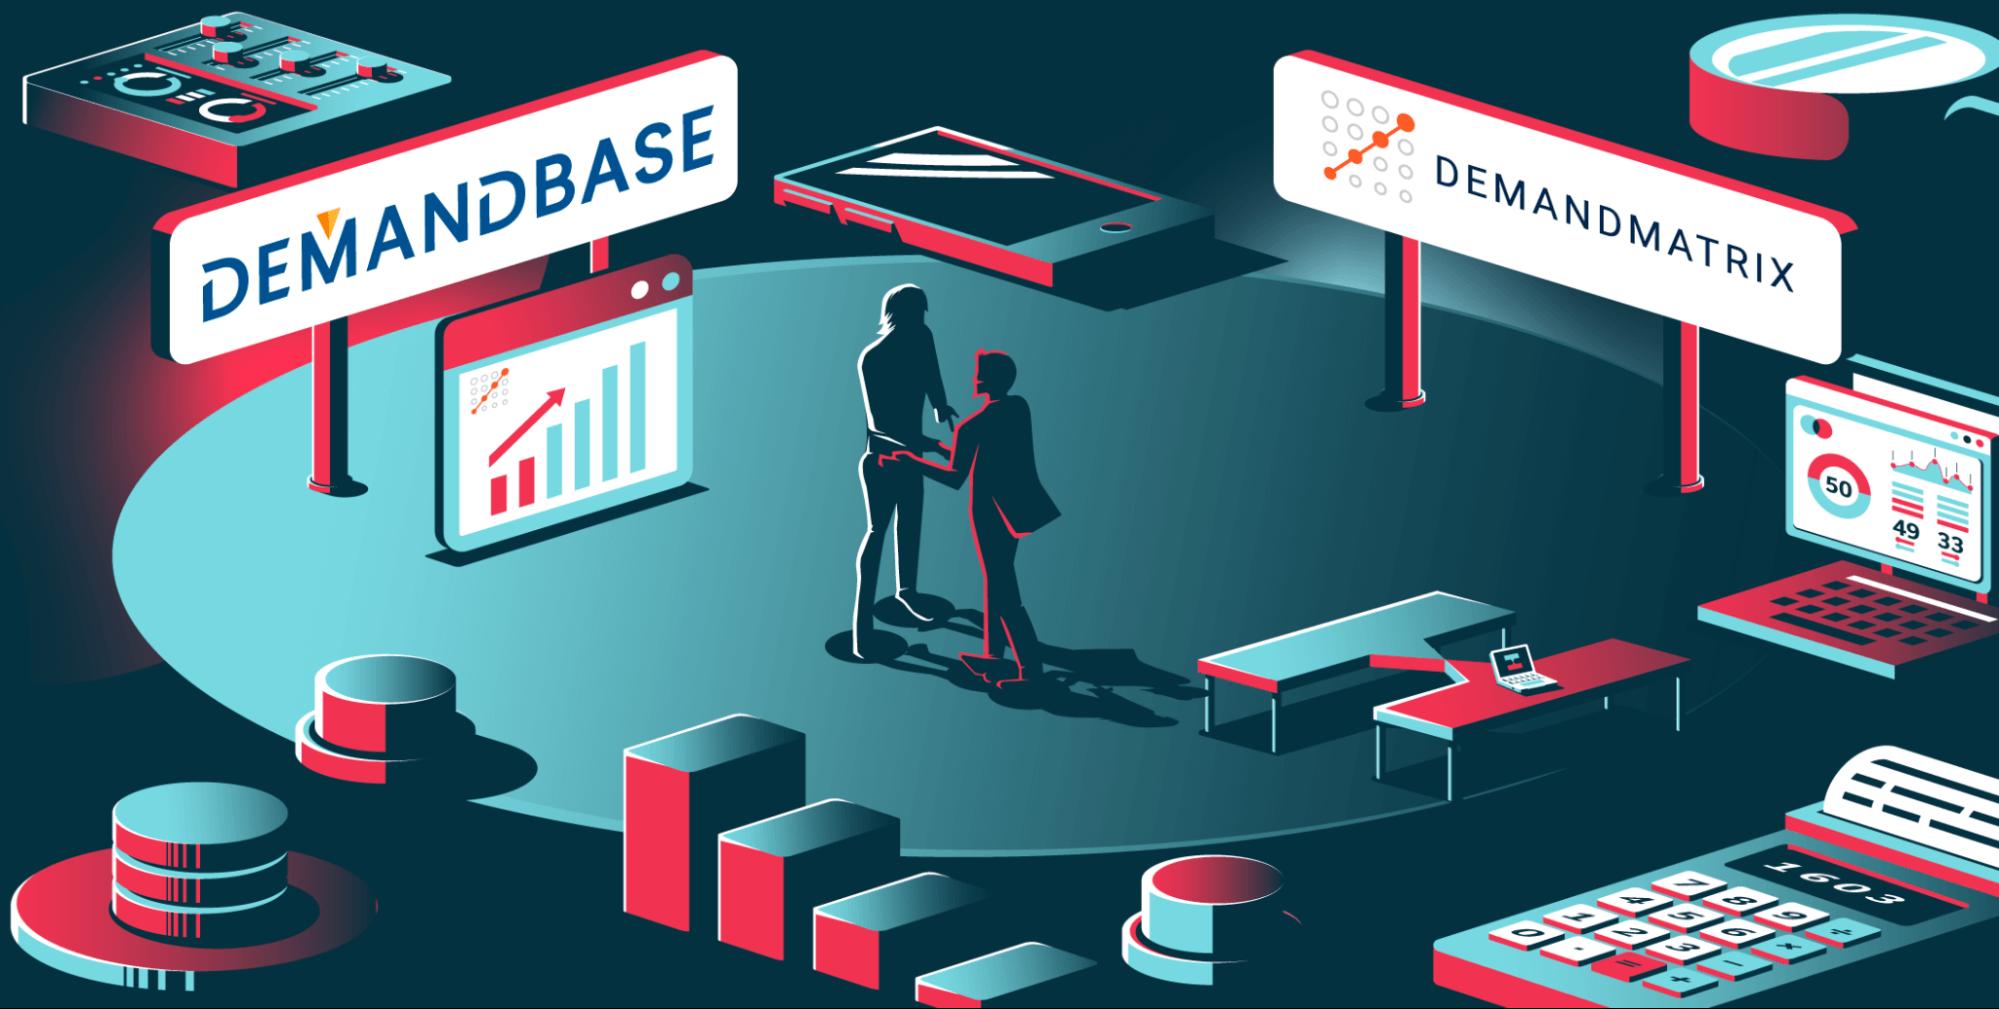 demandbase-demandmatrix-acquisition-crossbeam